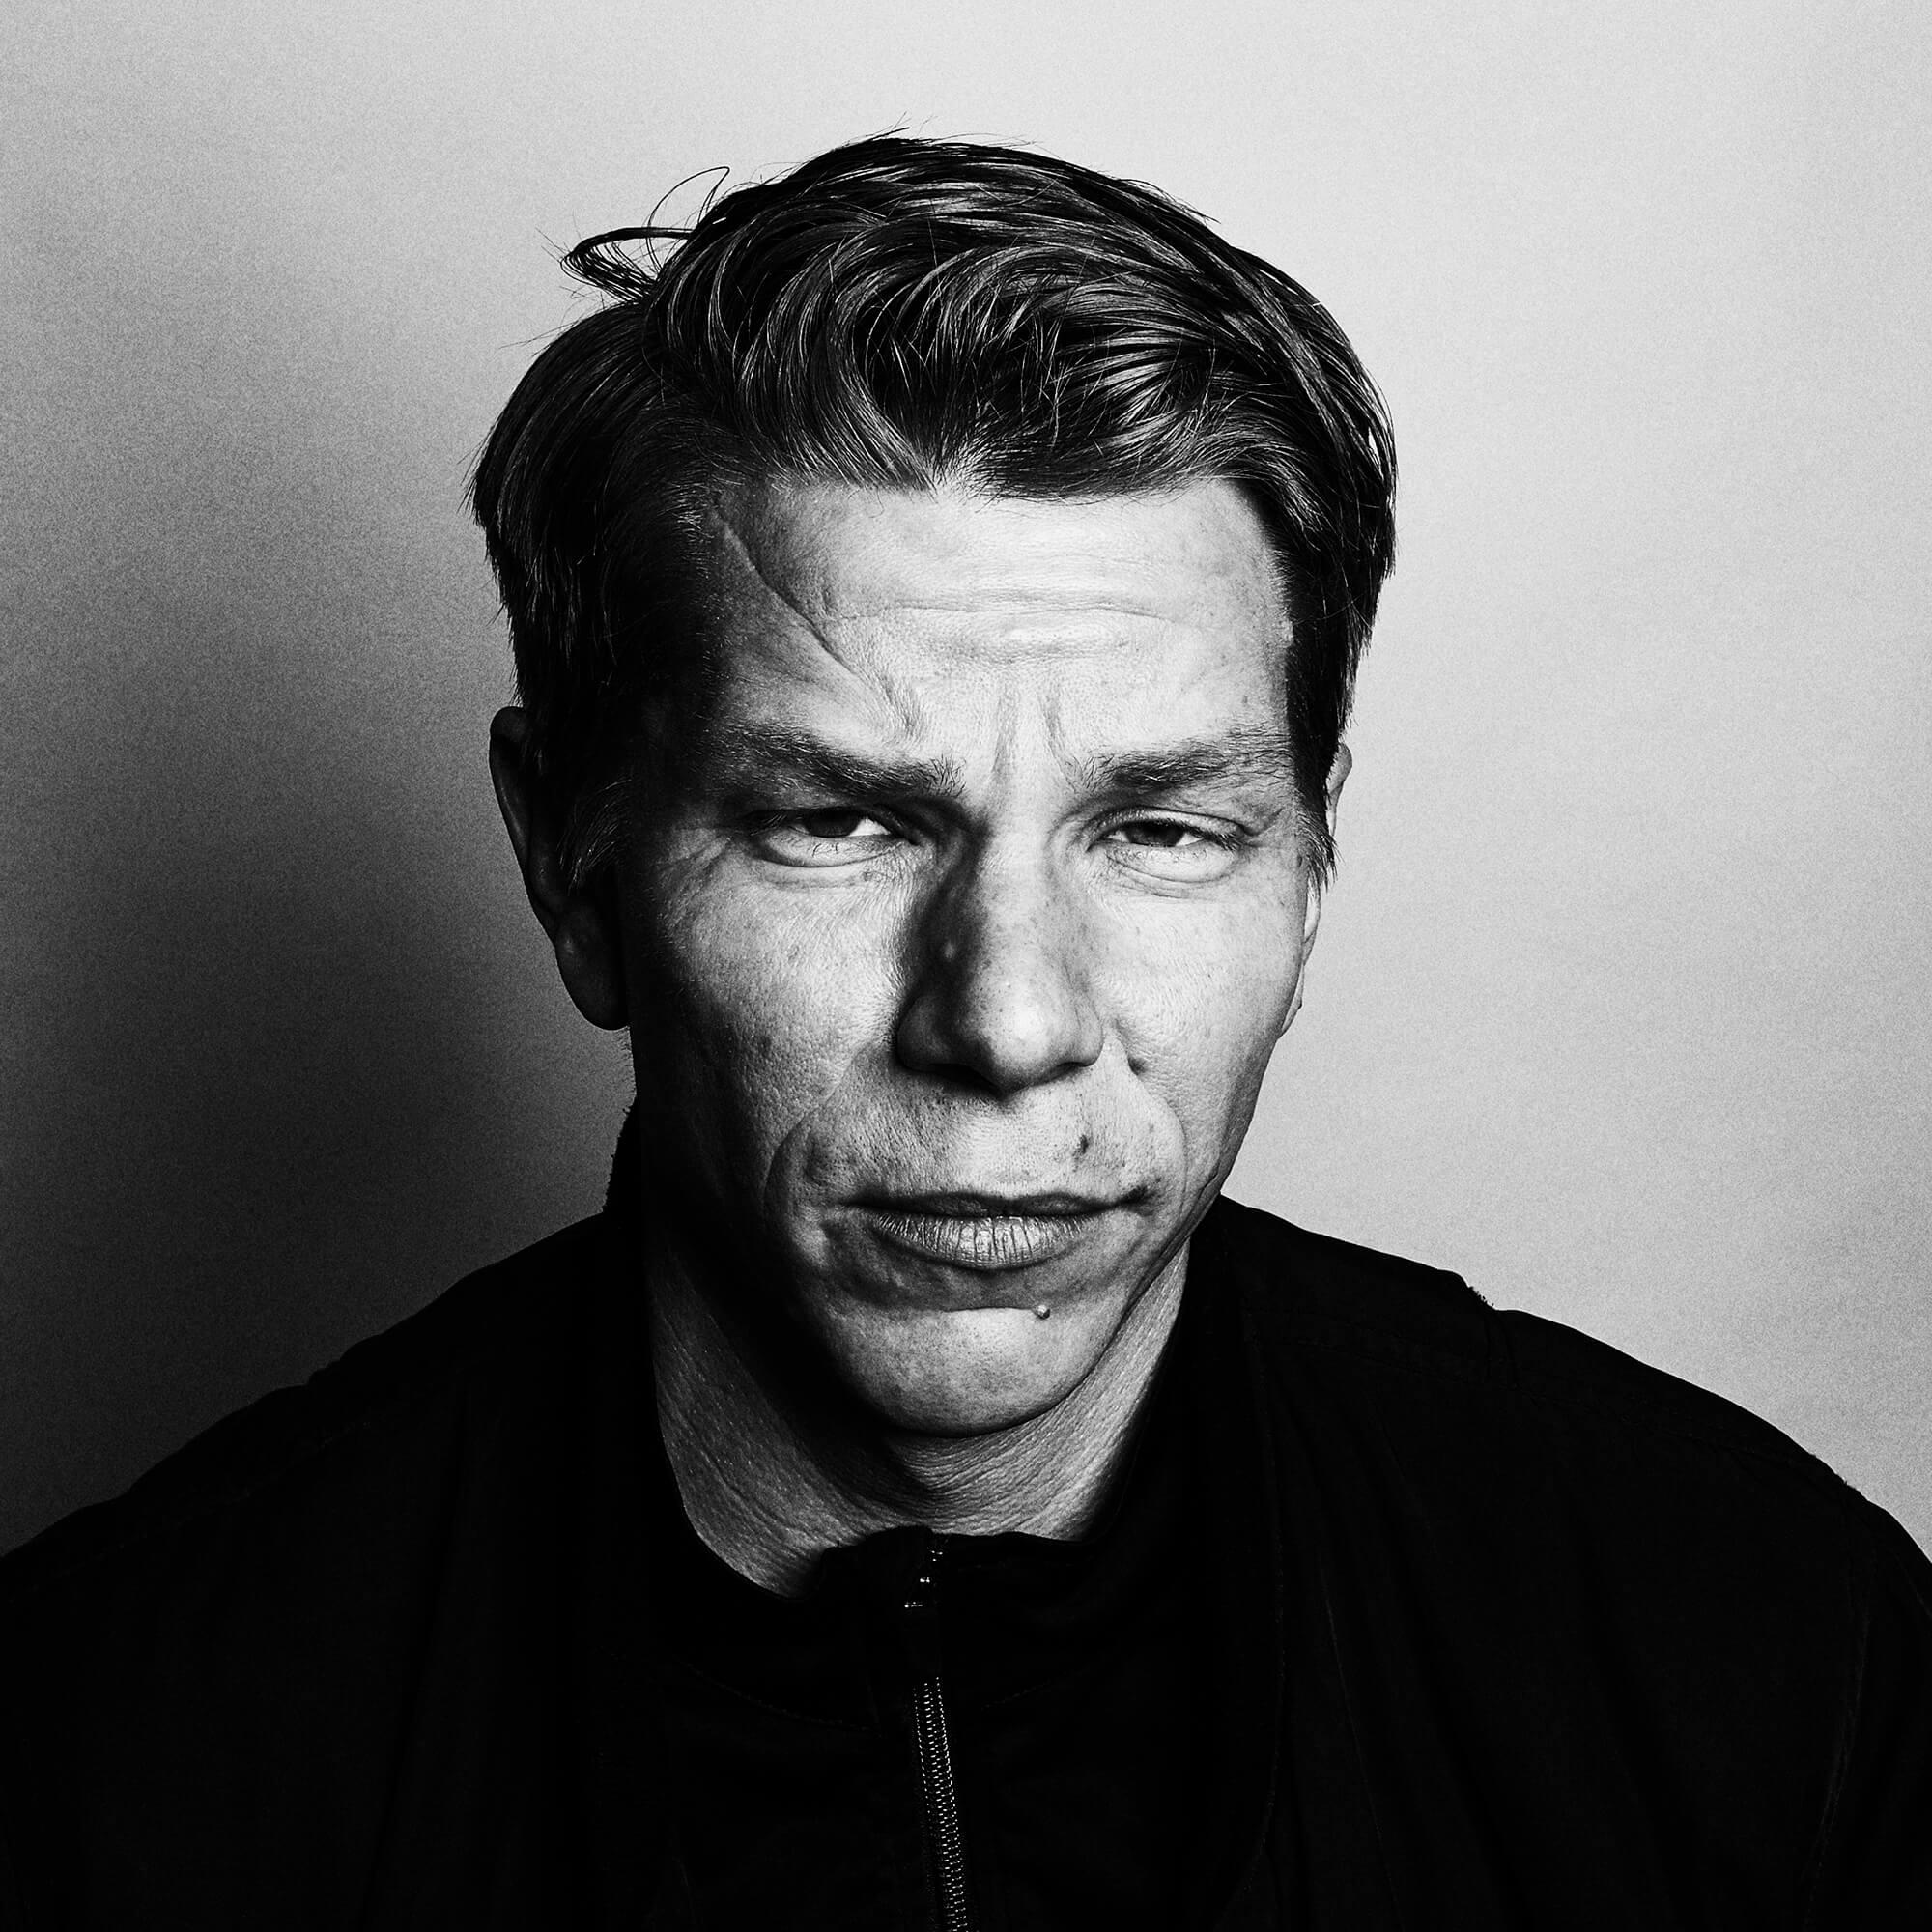 Portrait Series of Daniel Cati, black and white portrait of charismatic man